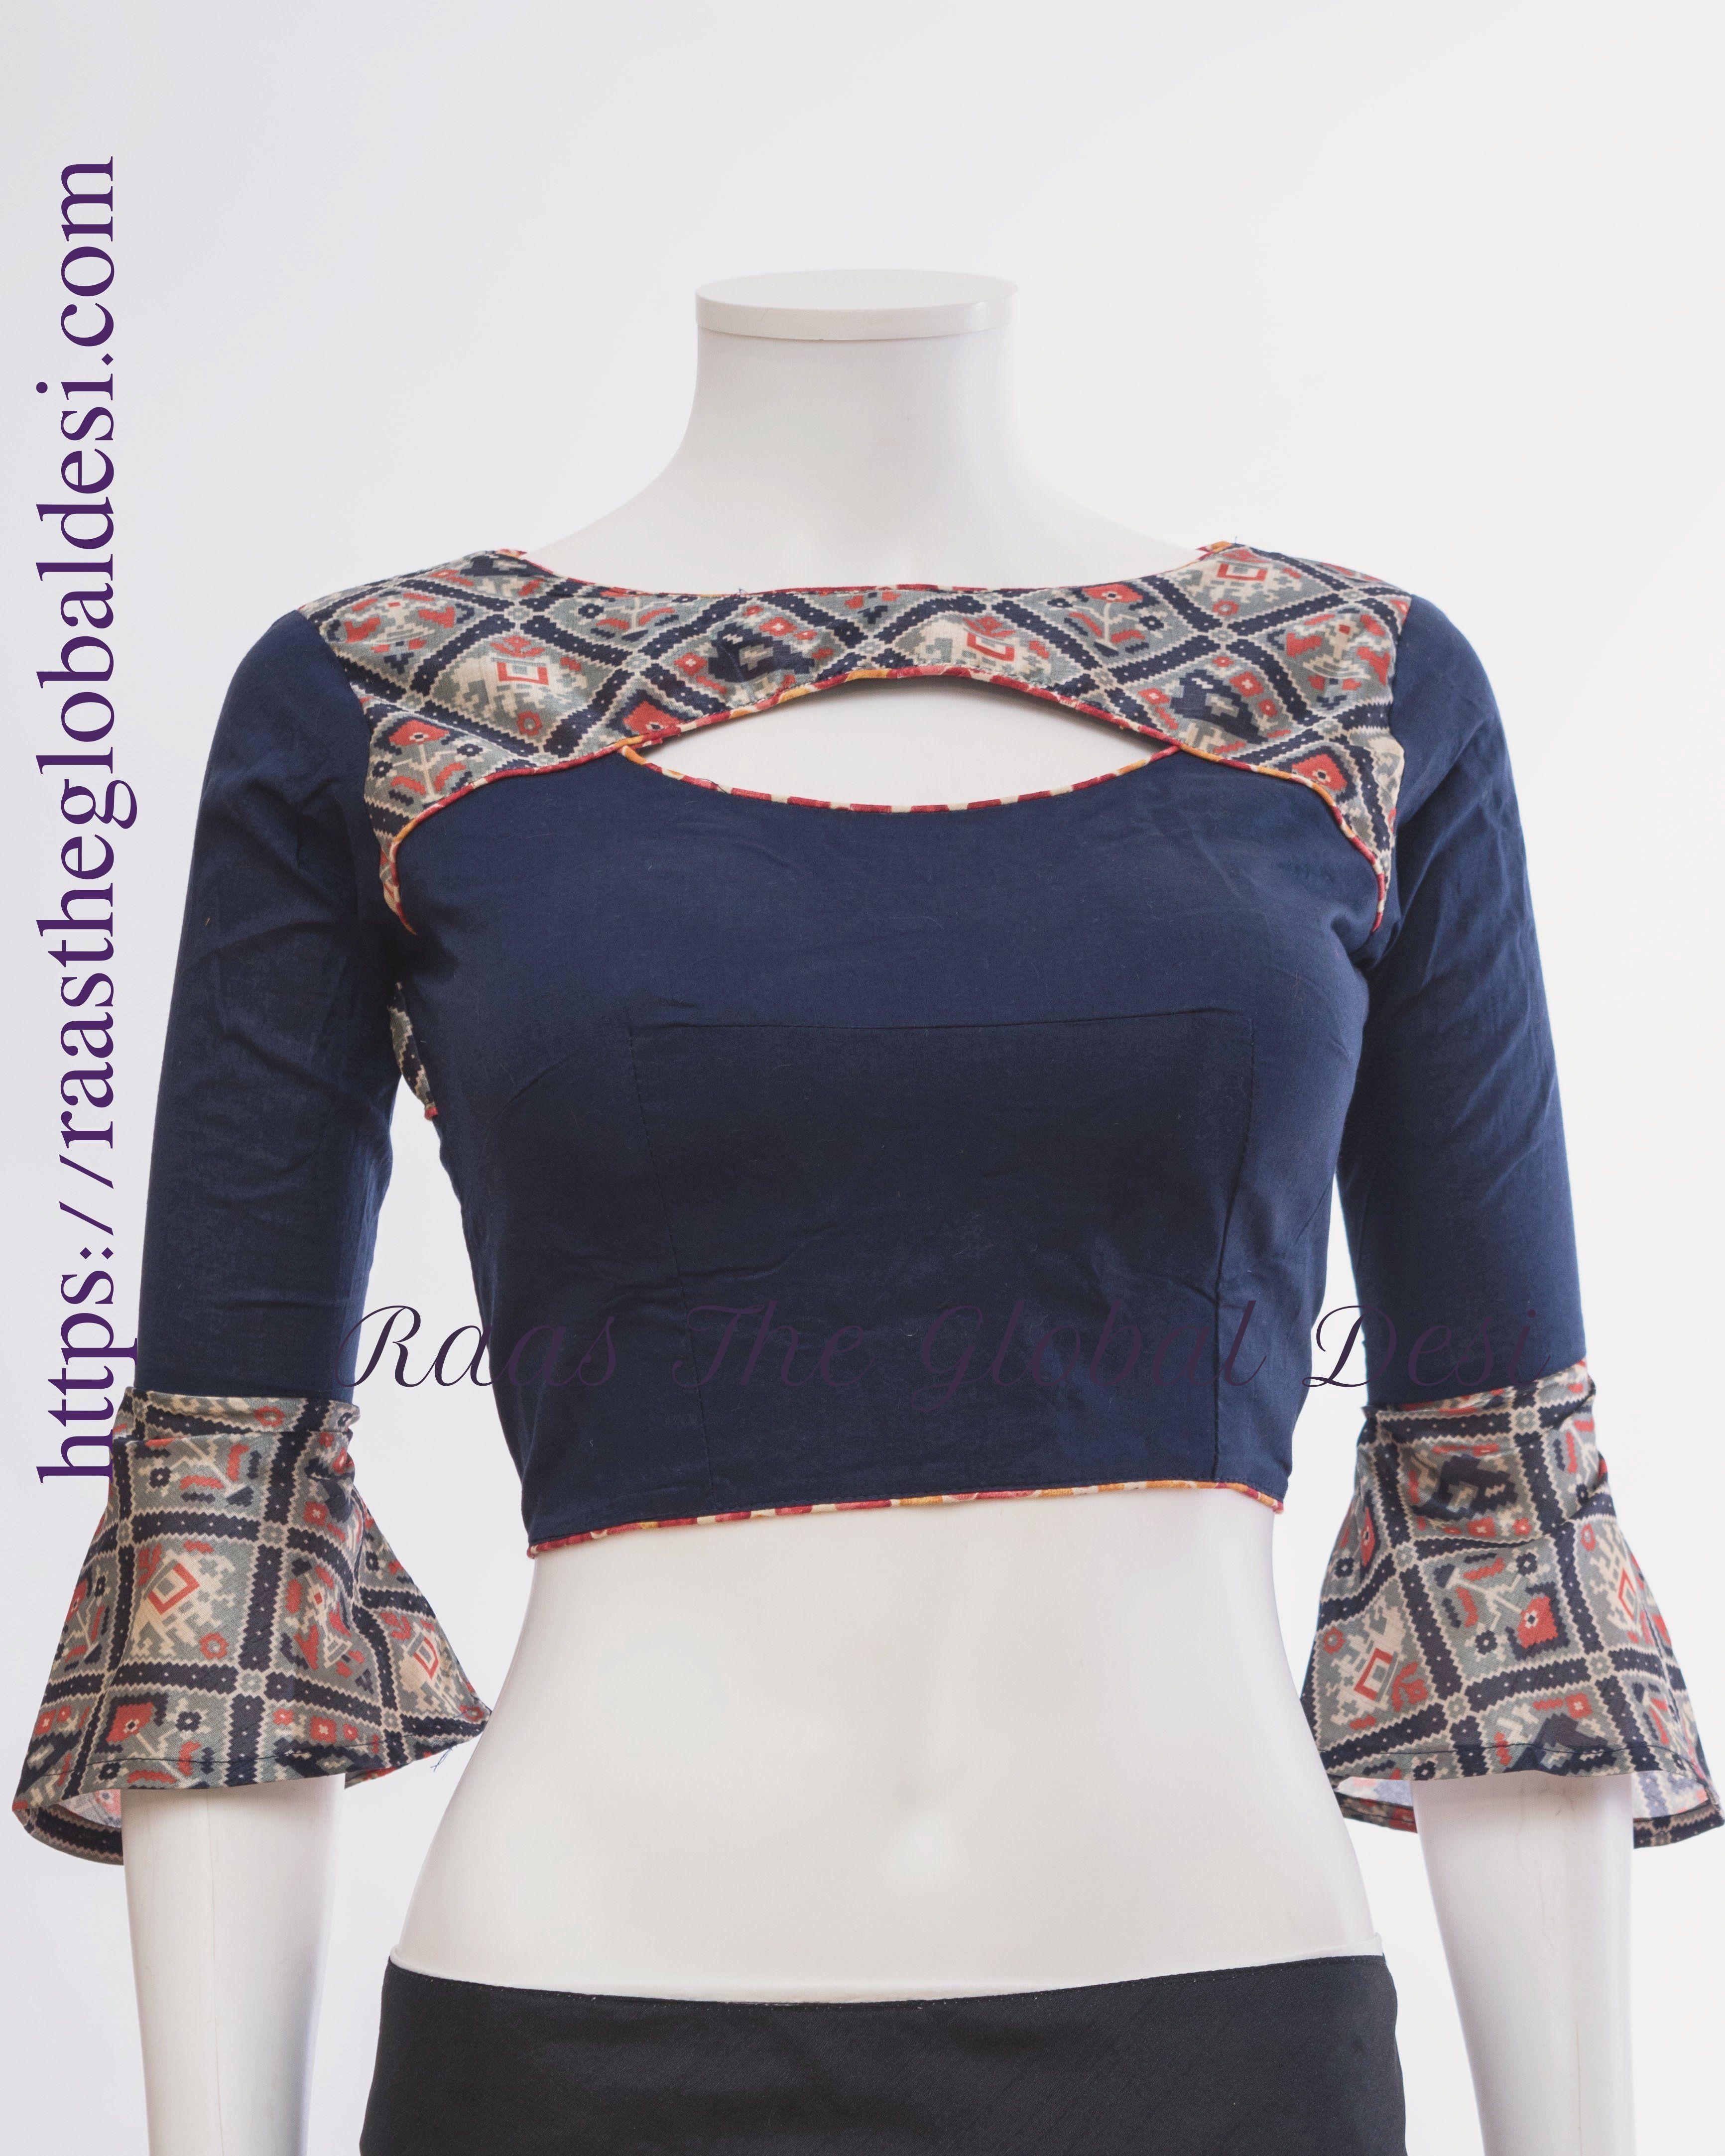 Saree sari India top stitch choli party fancy blouse ready chain top zip sleeve